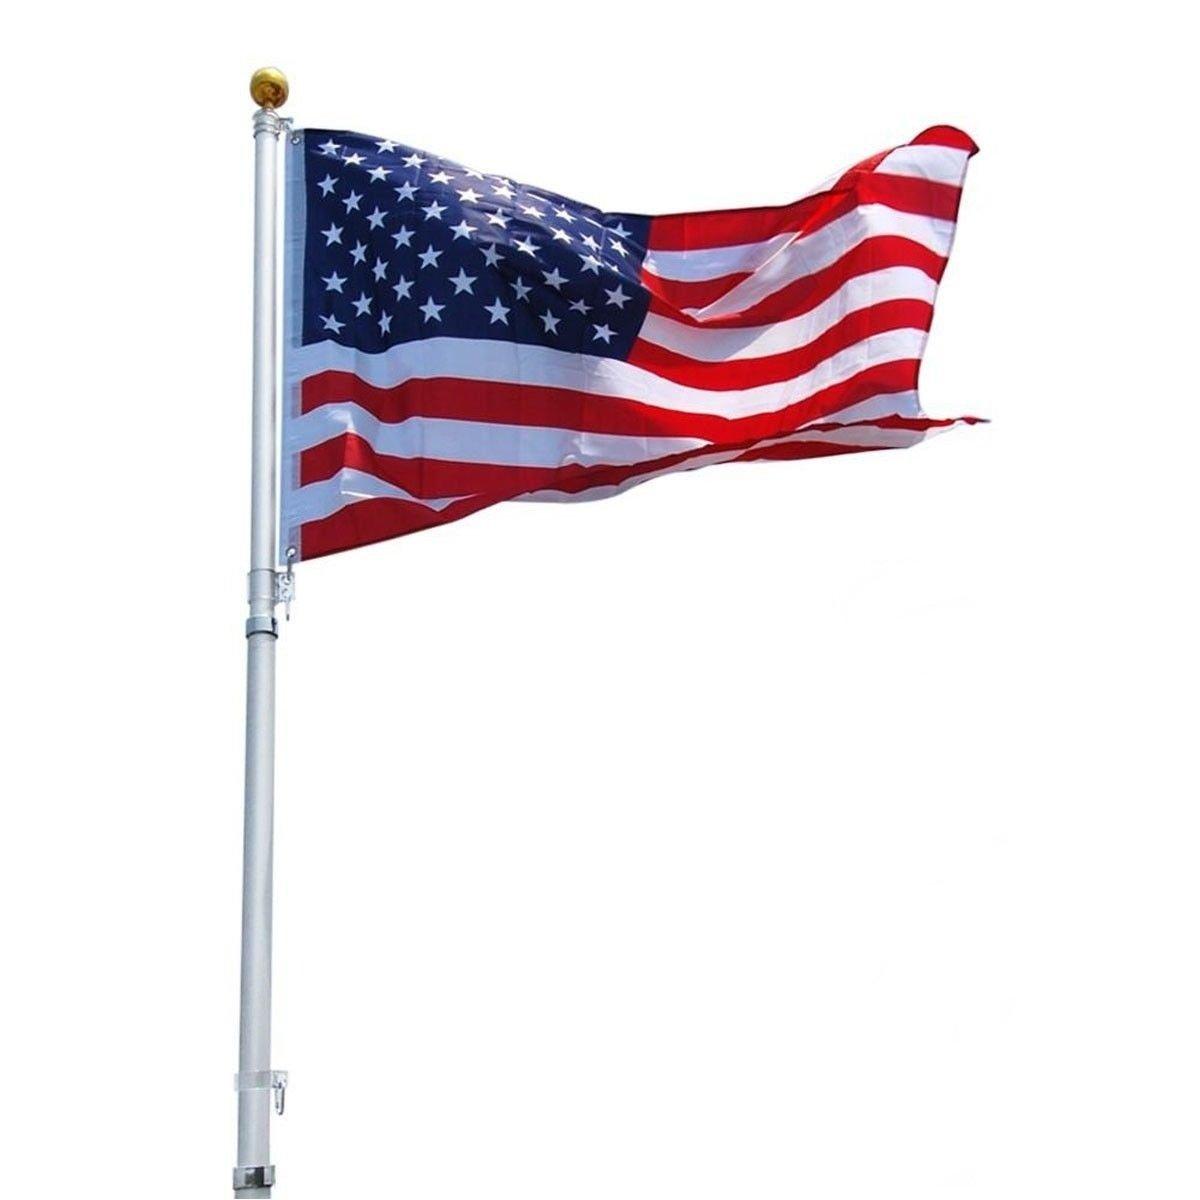 PVC Sleeve Outdoor 25FT Aluminum Telescoping America Flag& Flagpole Kit US w/ Gold Ball Finial